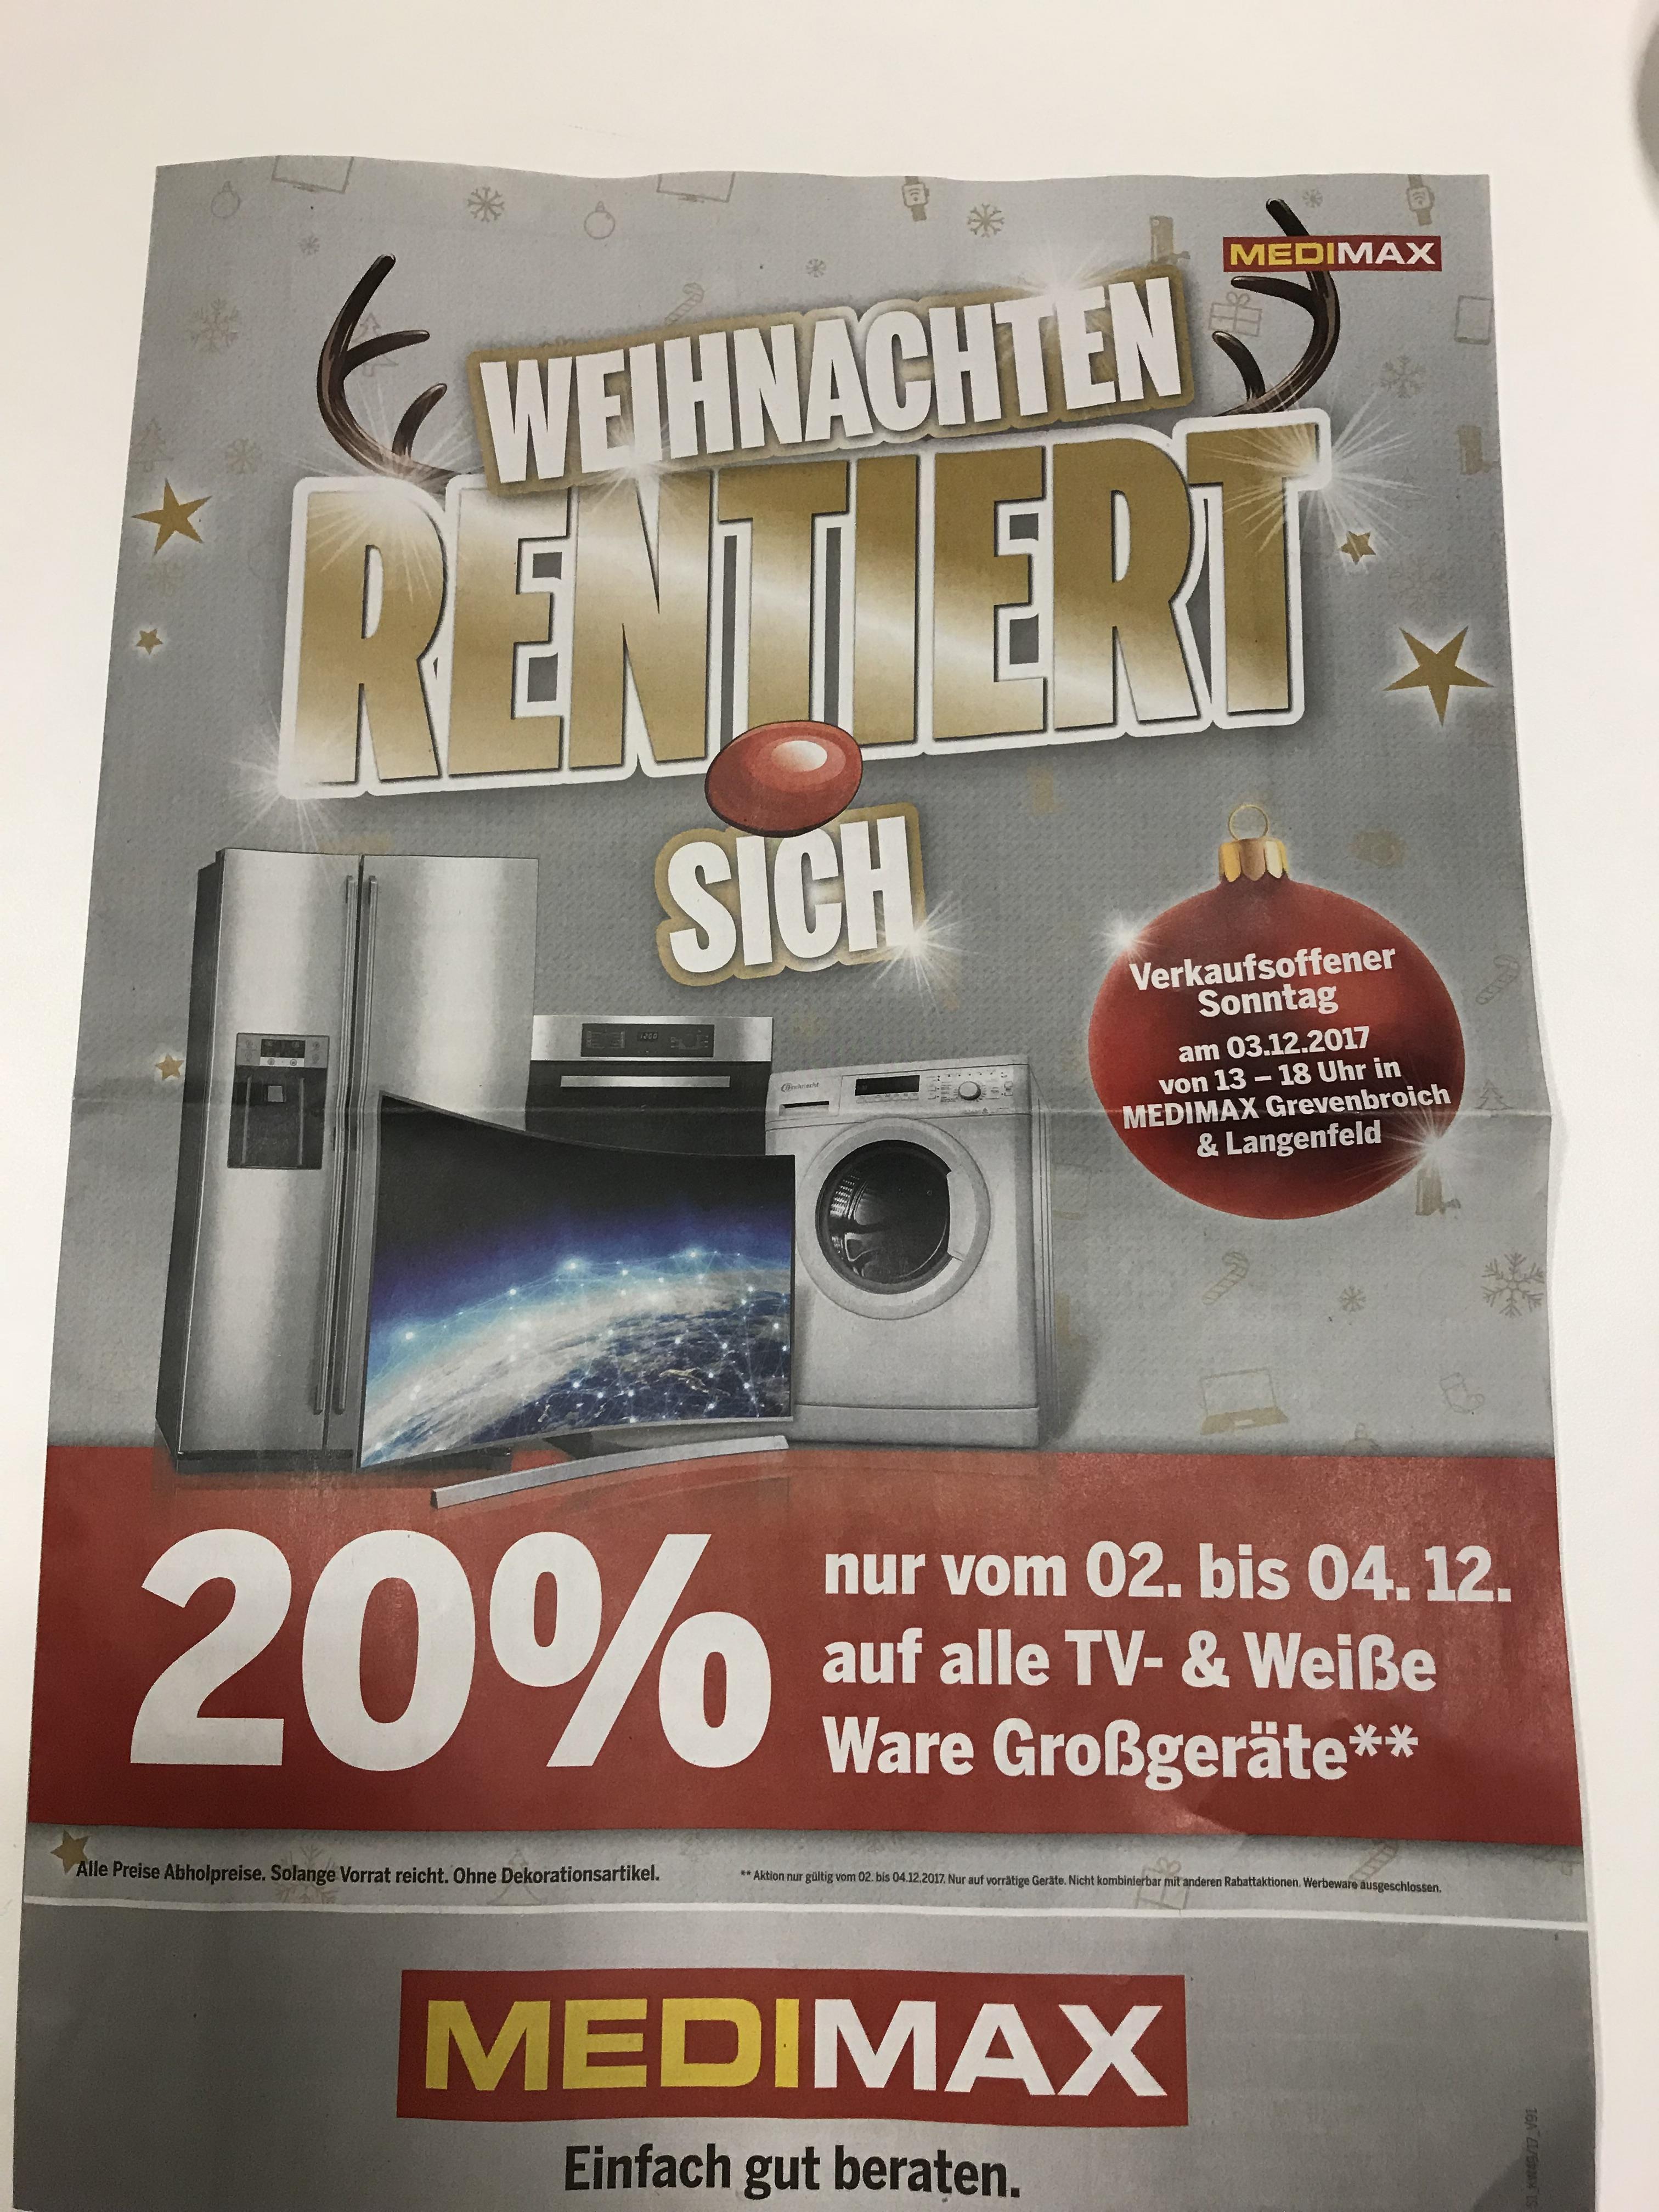 Medimax Grevenbroich 20%